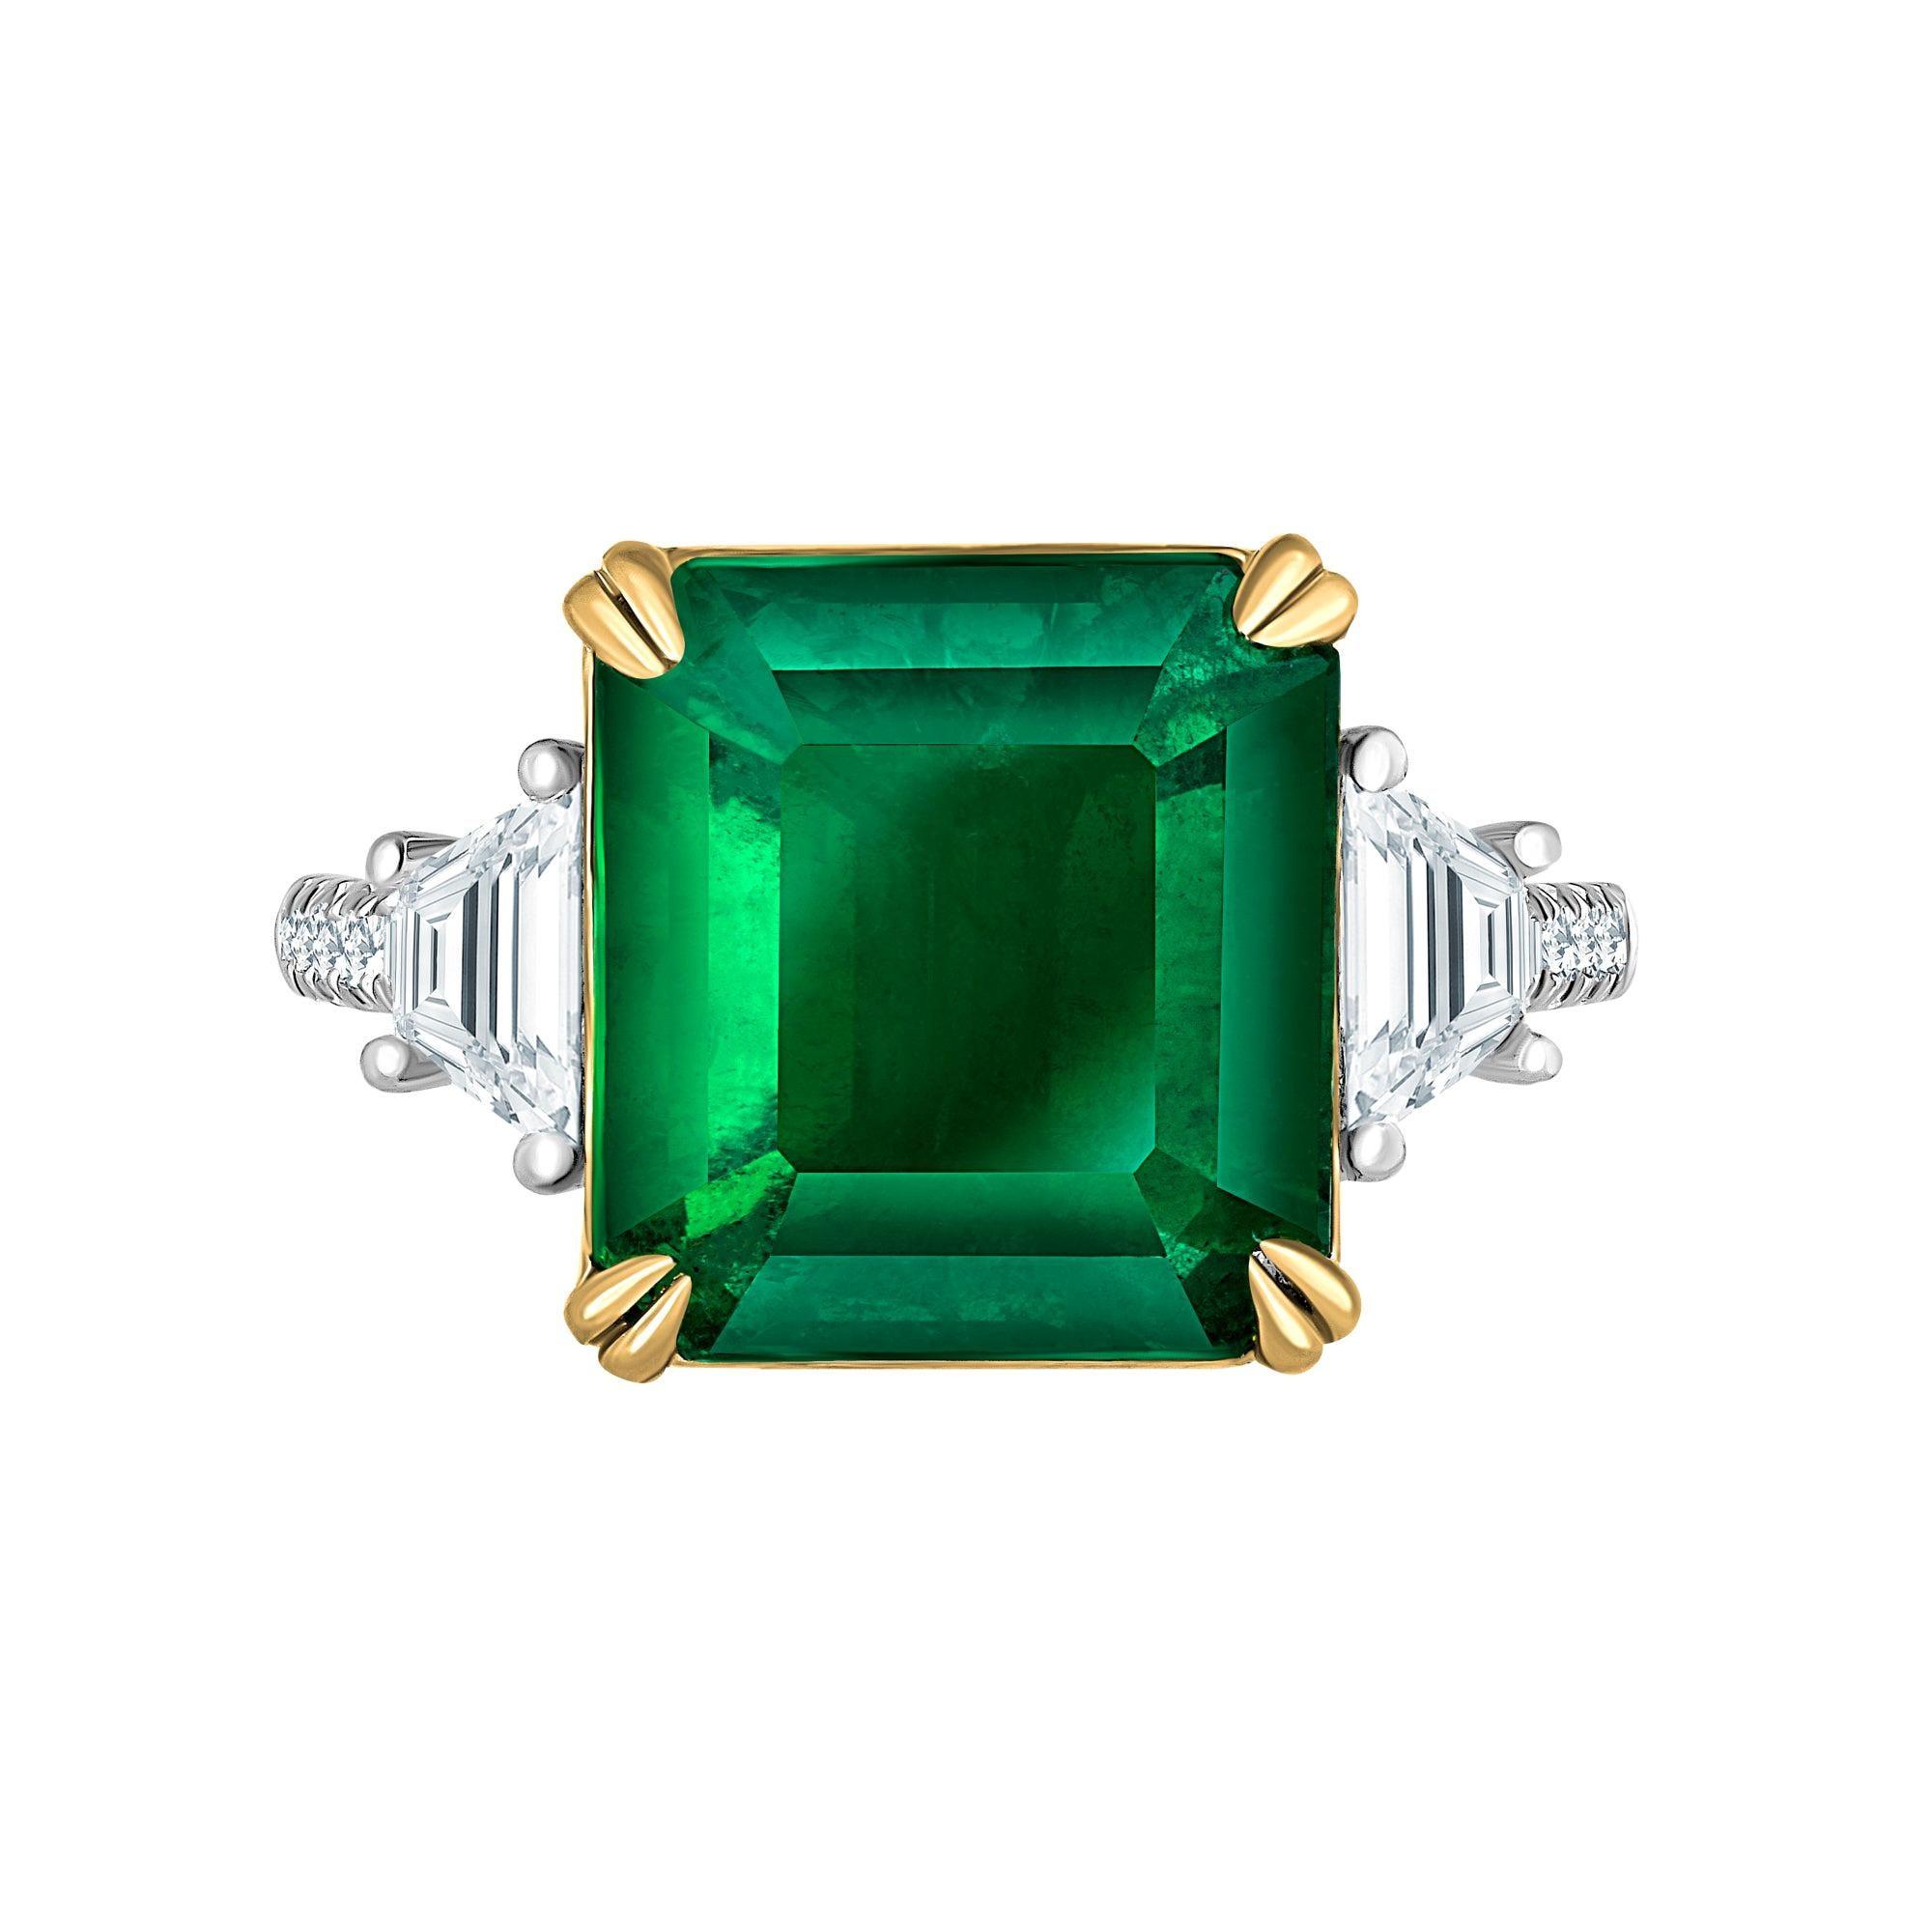 Emilio Jewelry Certified 8.46 Carat Vivid Green Colombian Emerald Diamond Ring